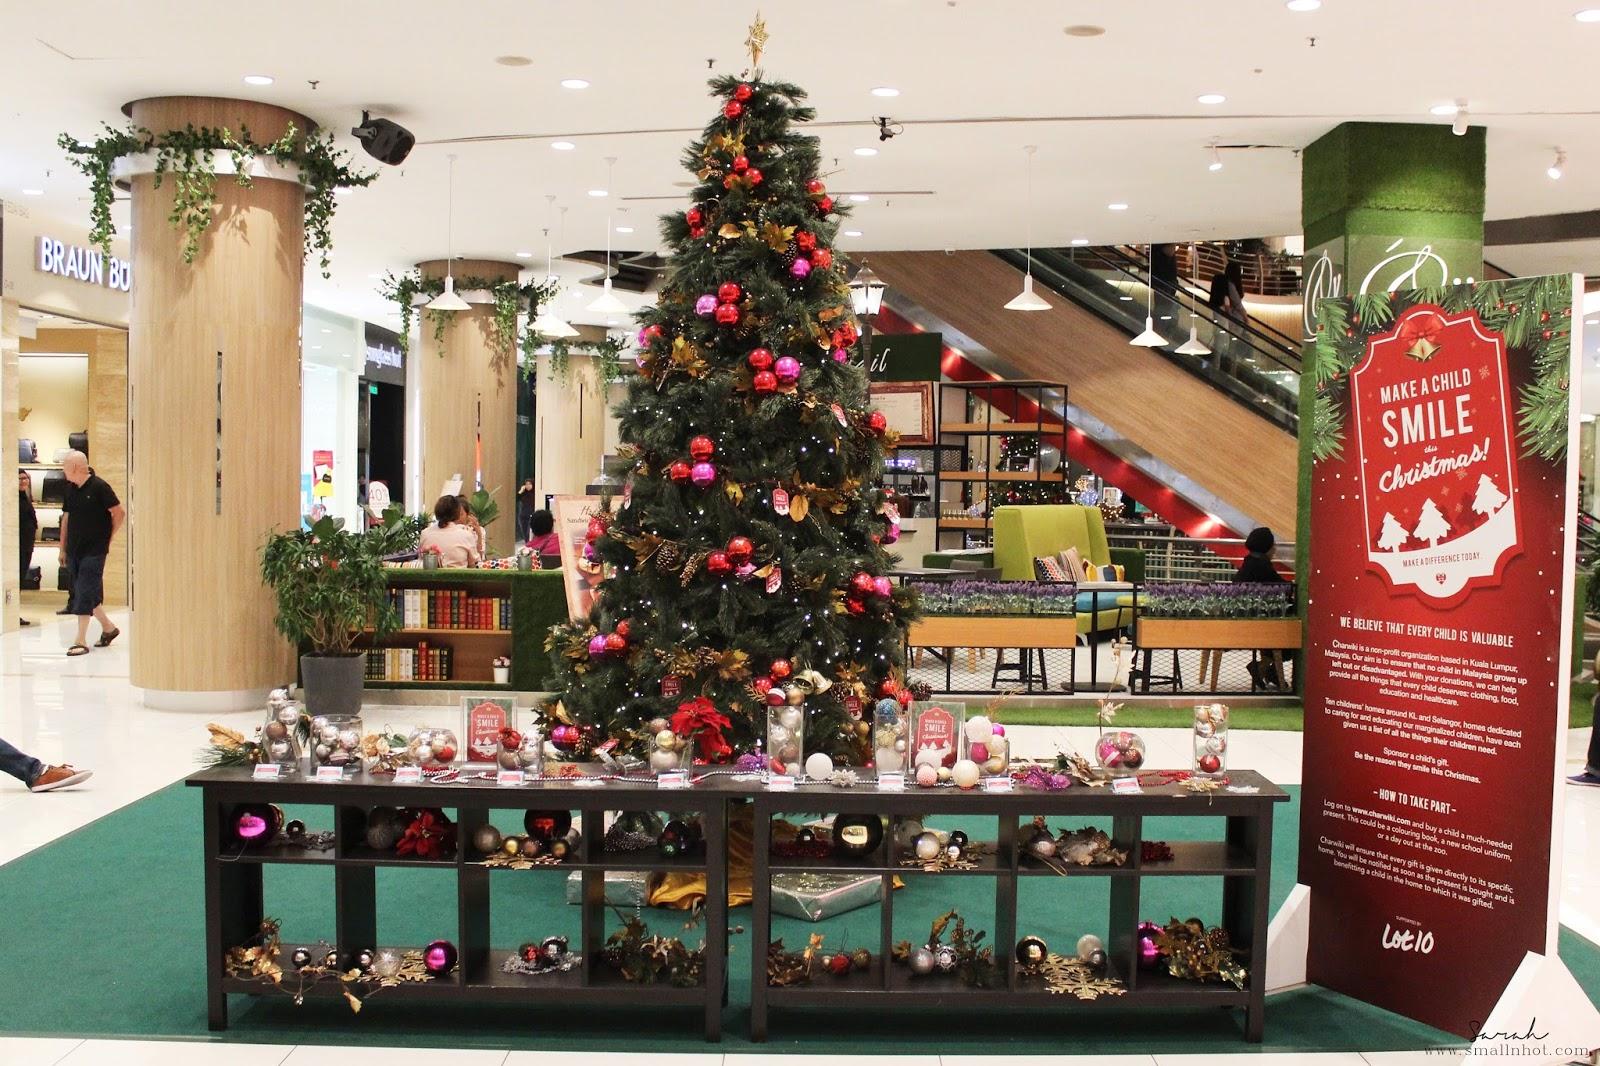 #A32D28 December 2016 Small N Hot: Malaysia & Singapore Fashion  5363 decorations de noel centre commercial 1600x1066 px @ aertt.com